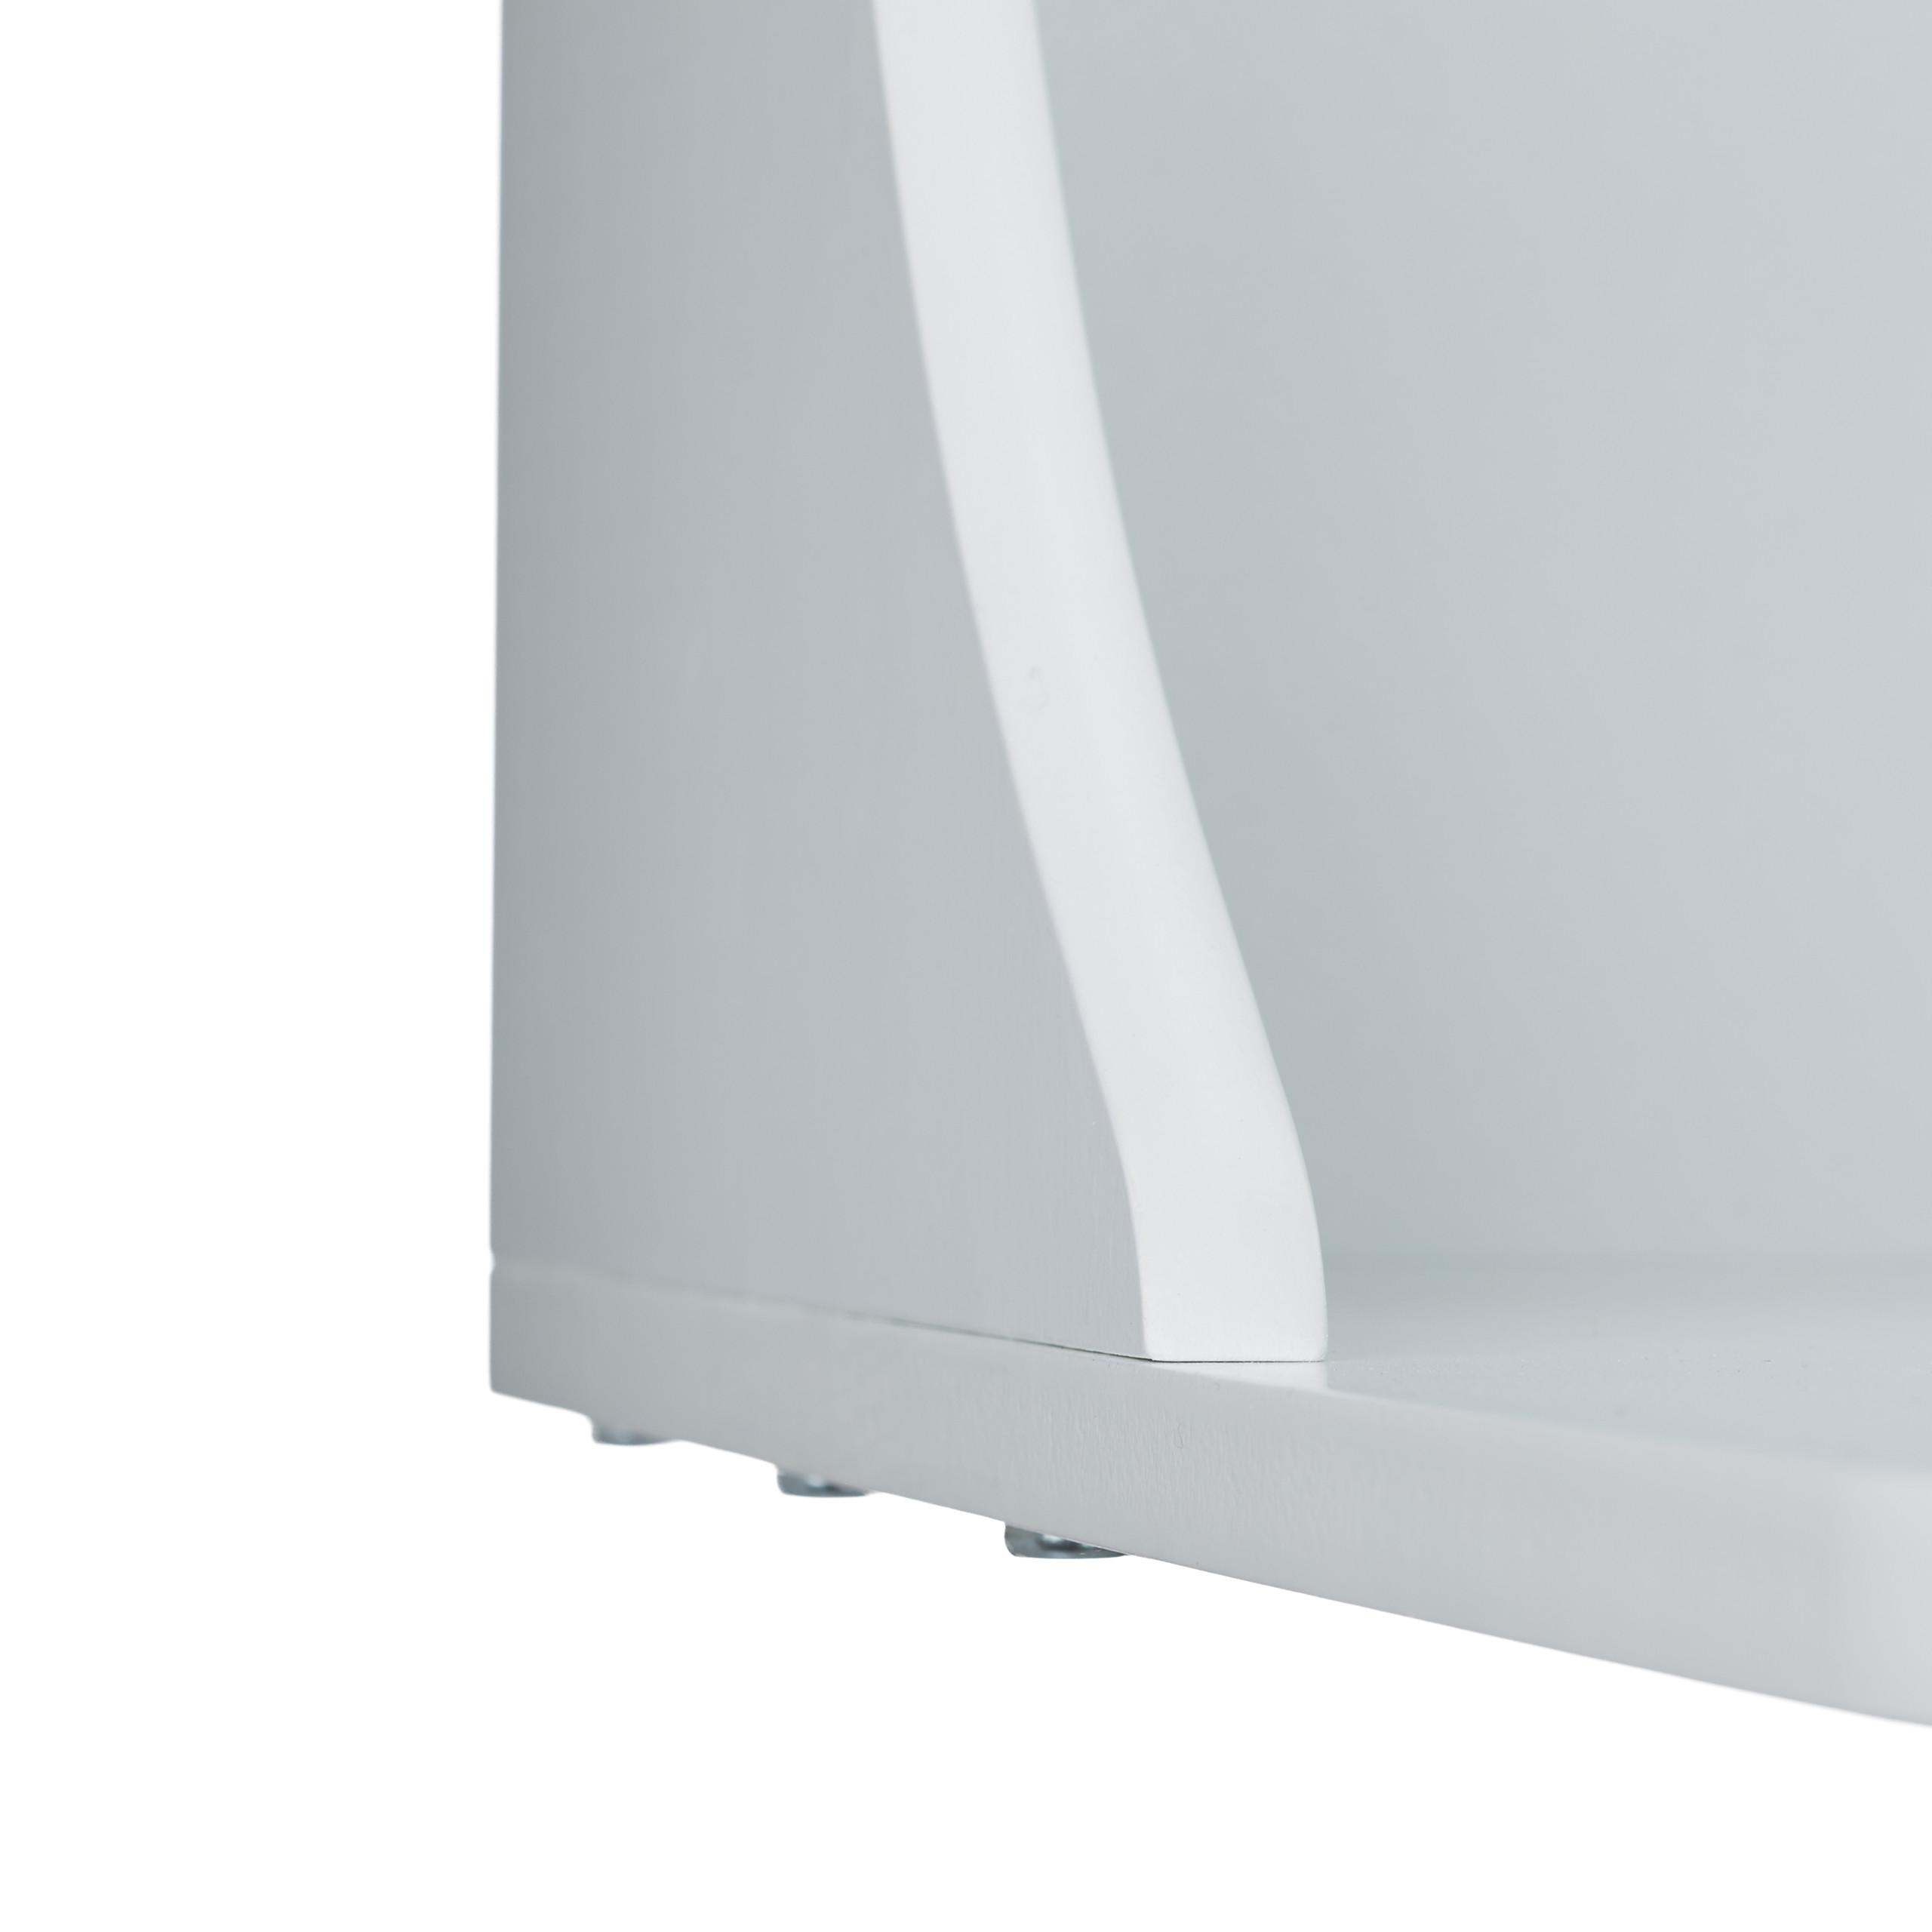 bureau-kinderbureau-ruimtebesparend-75-cm-hoog-laptoptafel-120-breed miniatuur 10